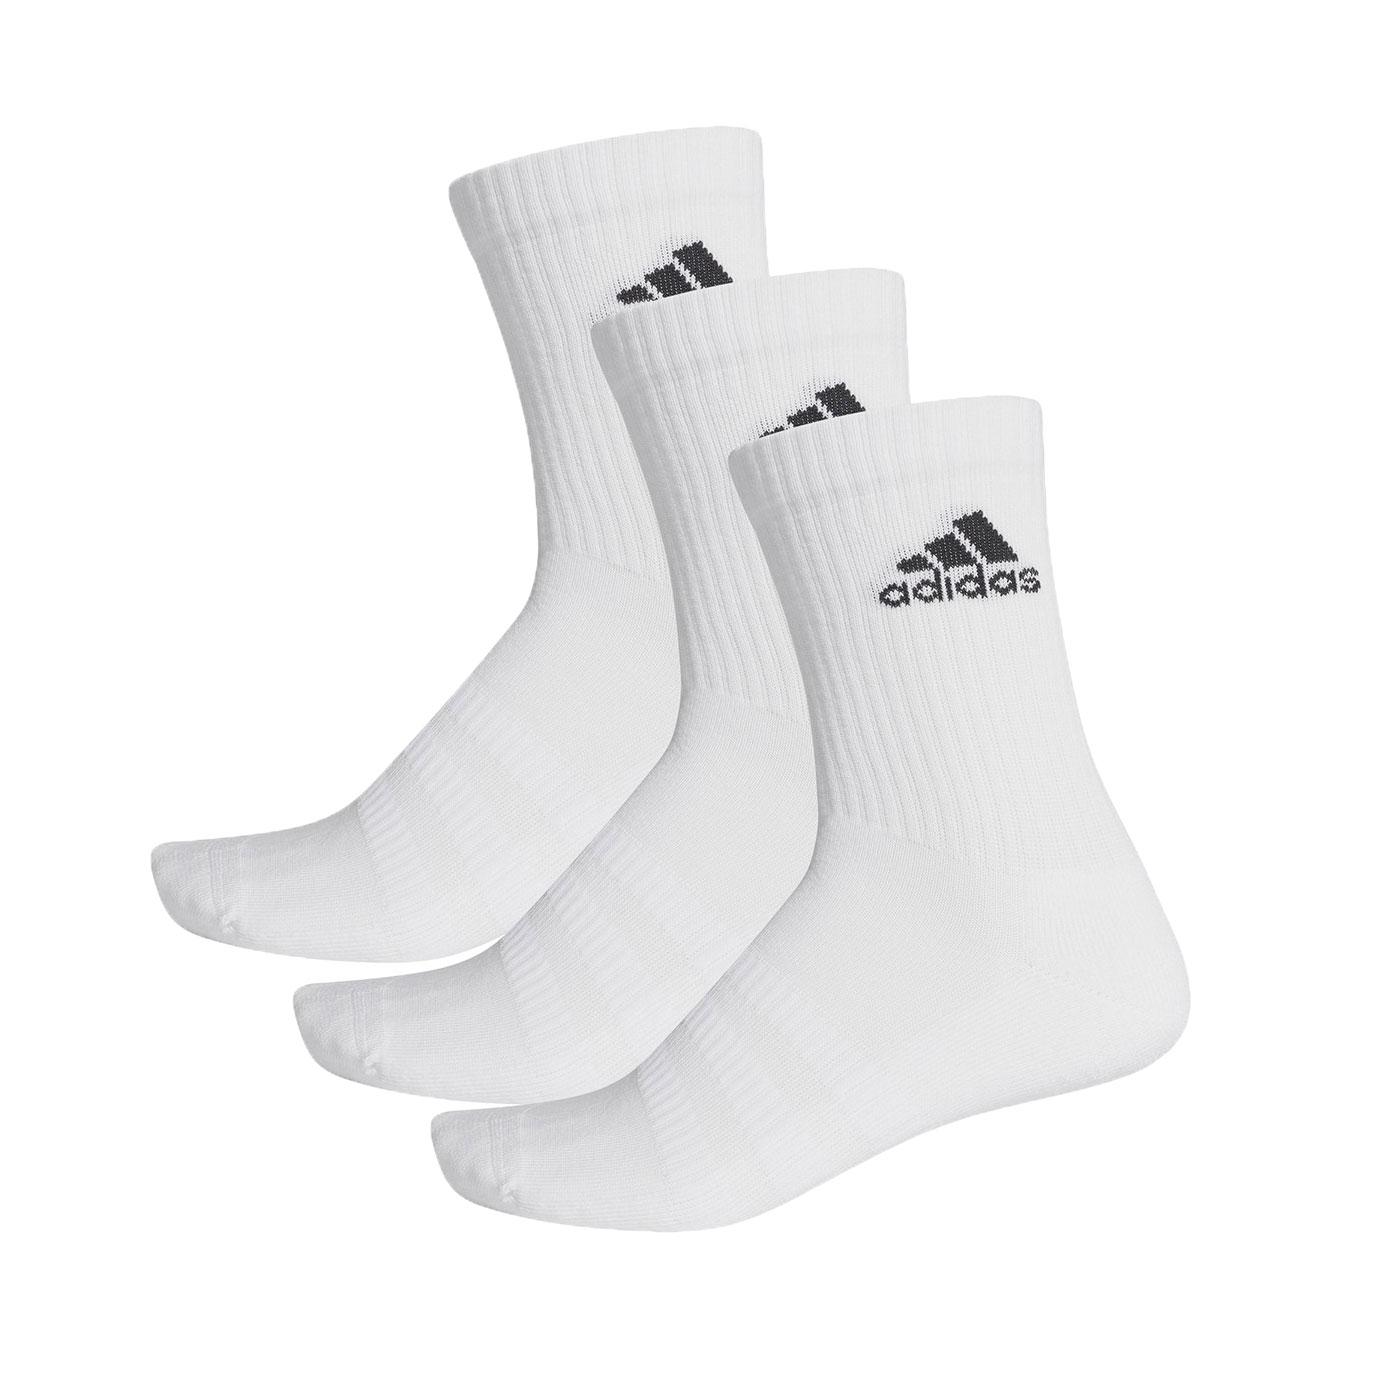 ADIDAS 運動中筒襪(三雙入) DZ9356 - 白黑